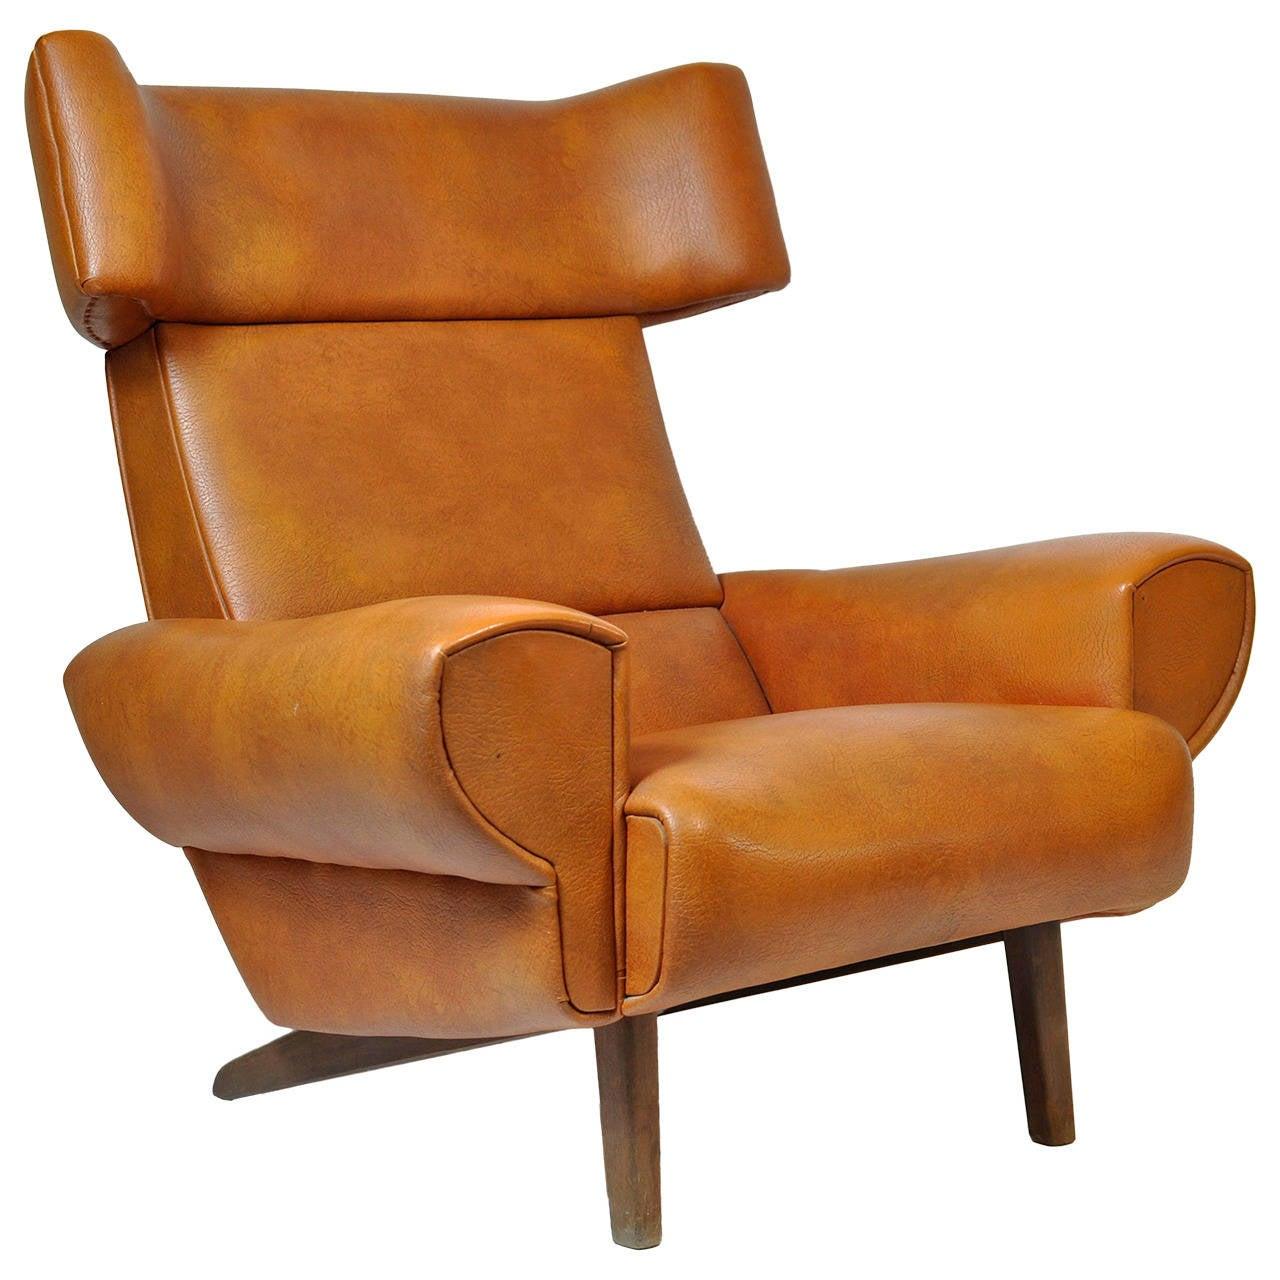 1970s Danish Lounge Chair At 1stdibs